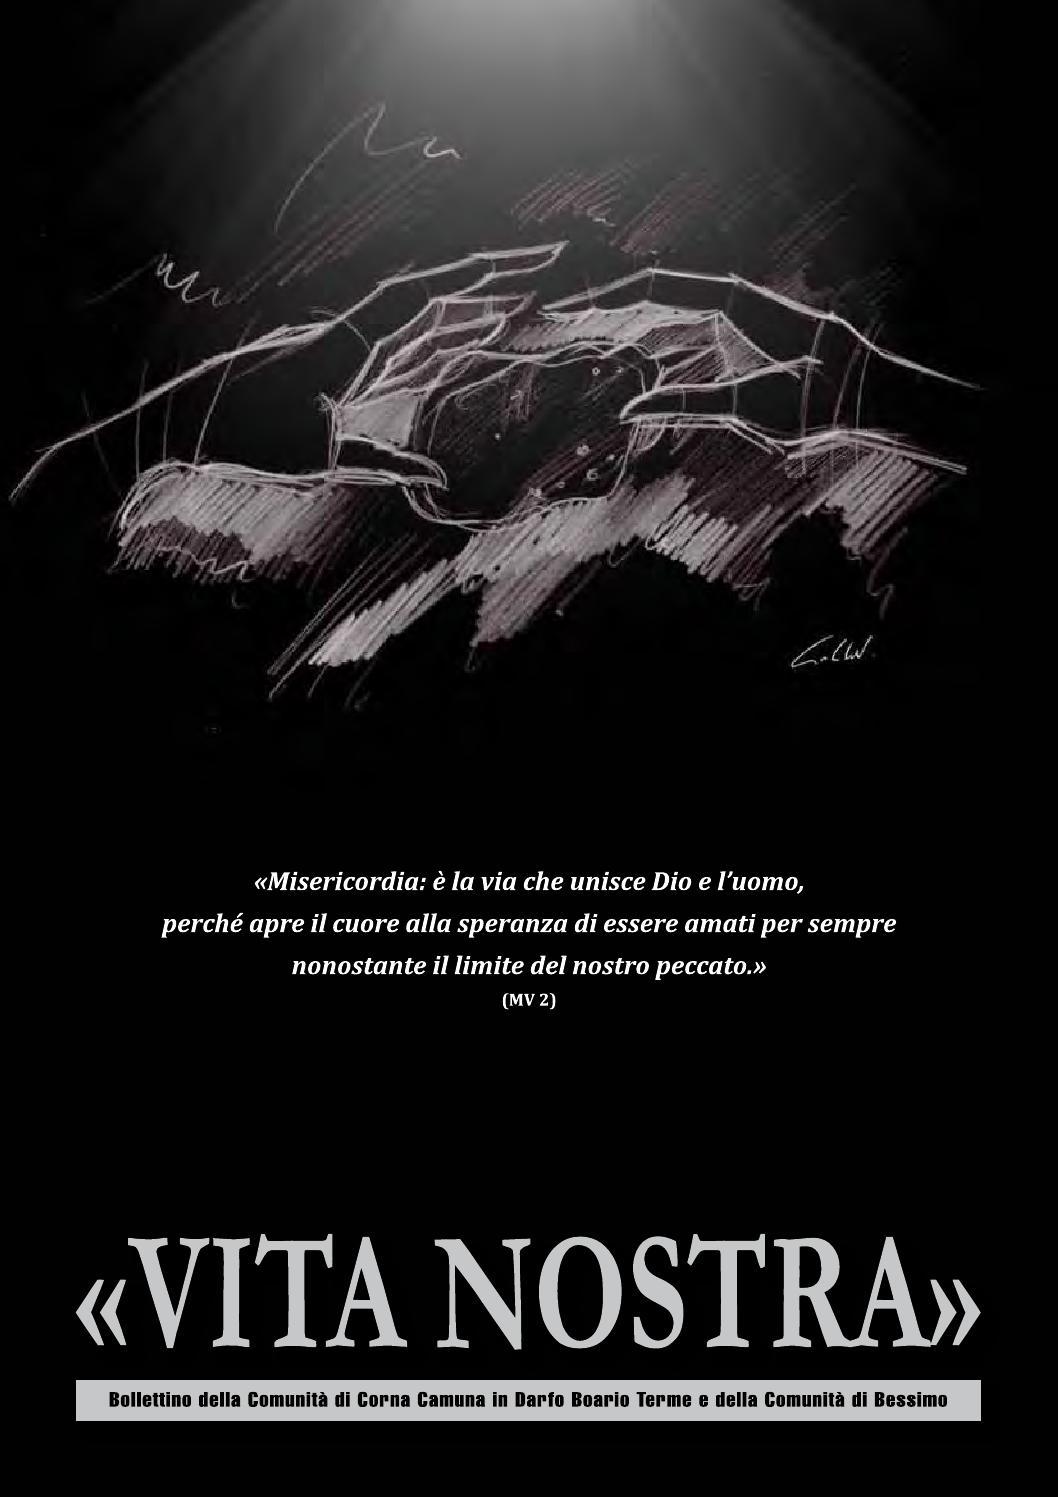 Vita nostra pasqua by Montagne  Paesi - issuu be1ce02acf13